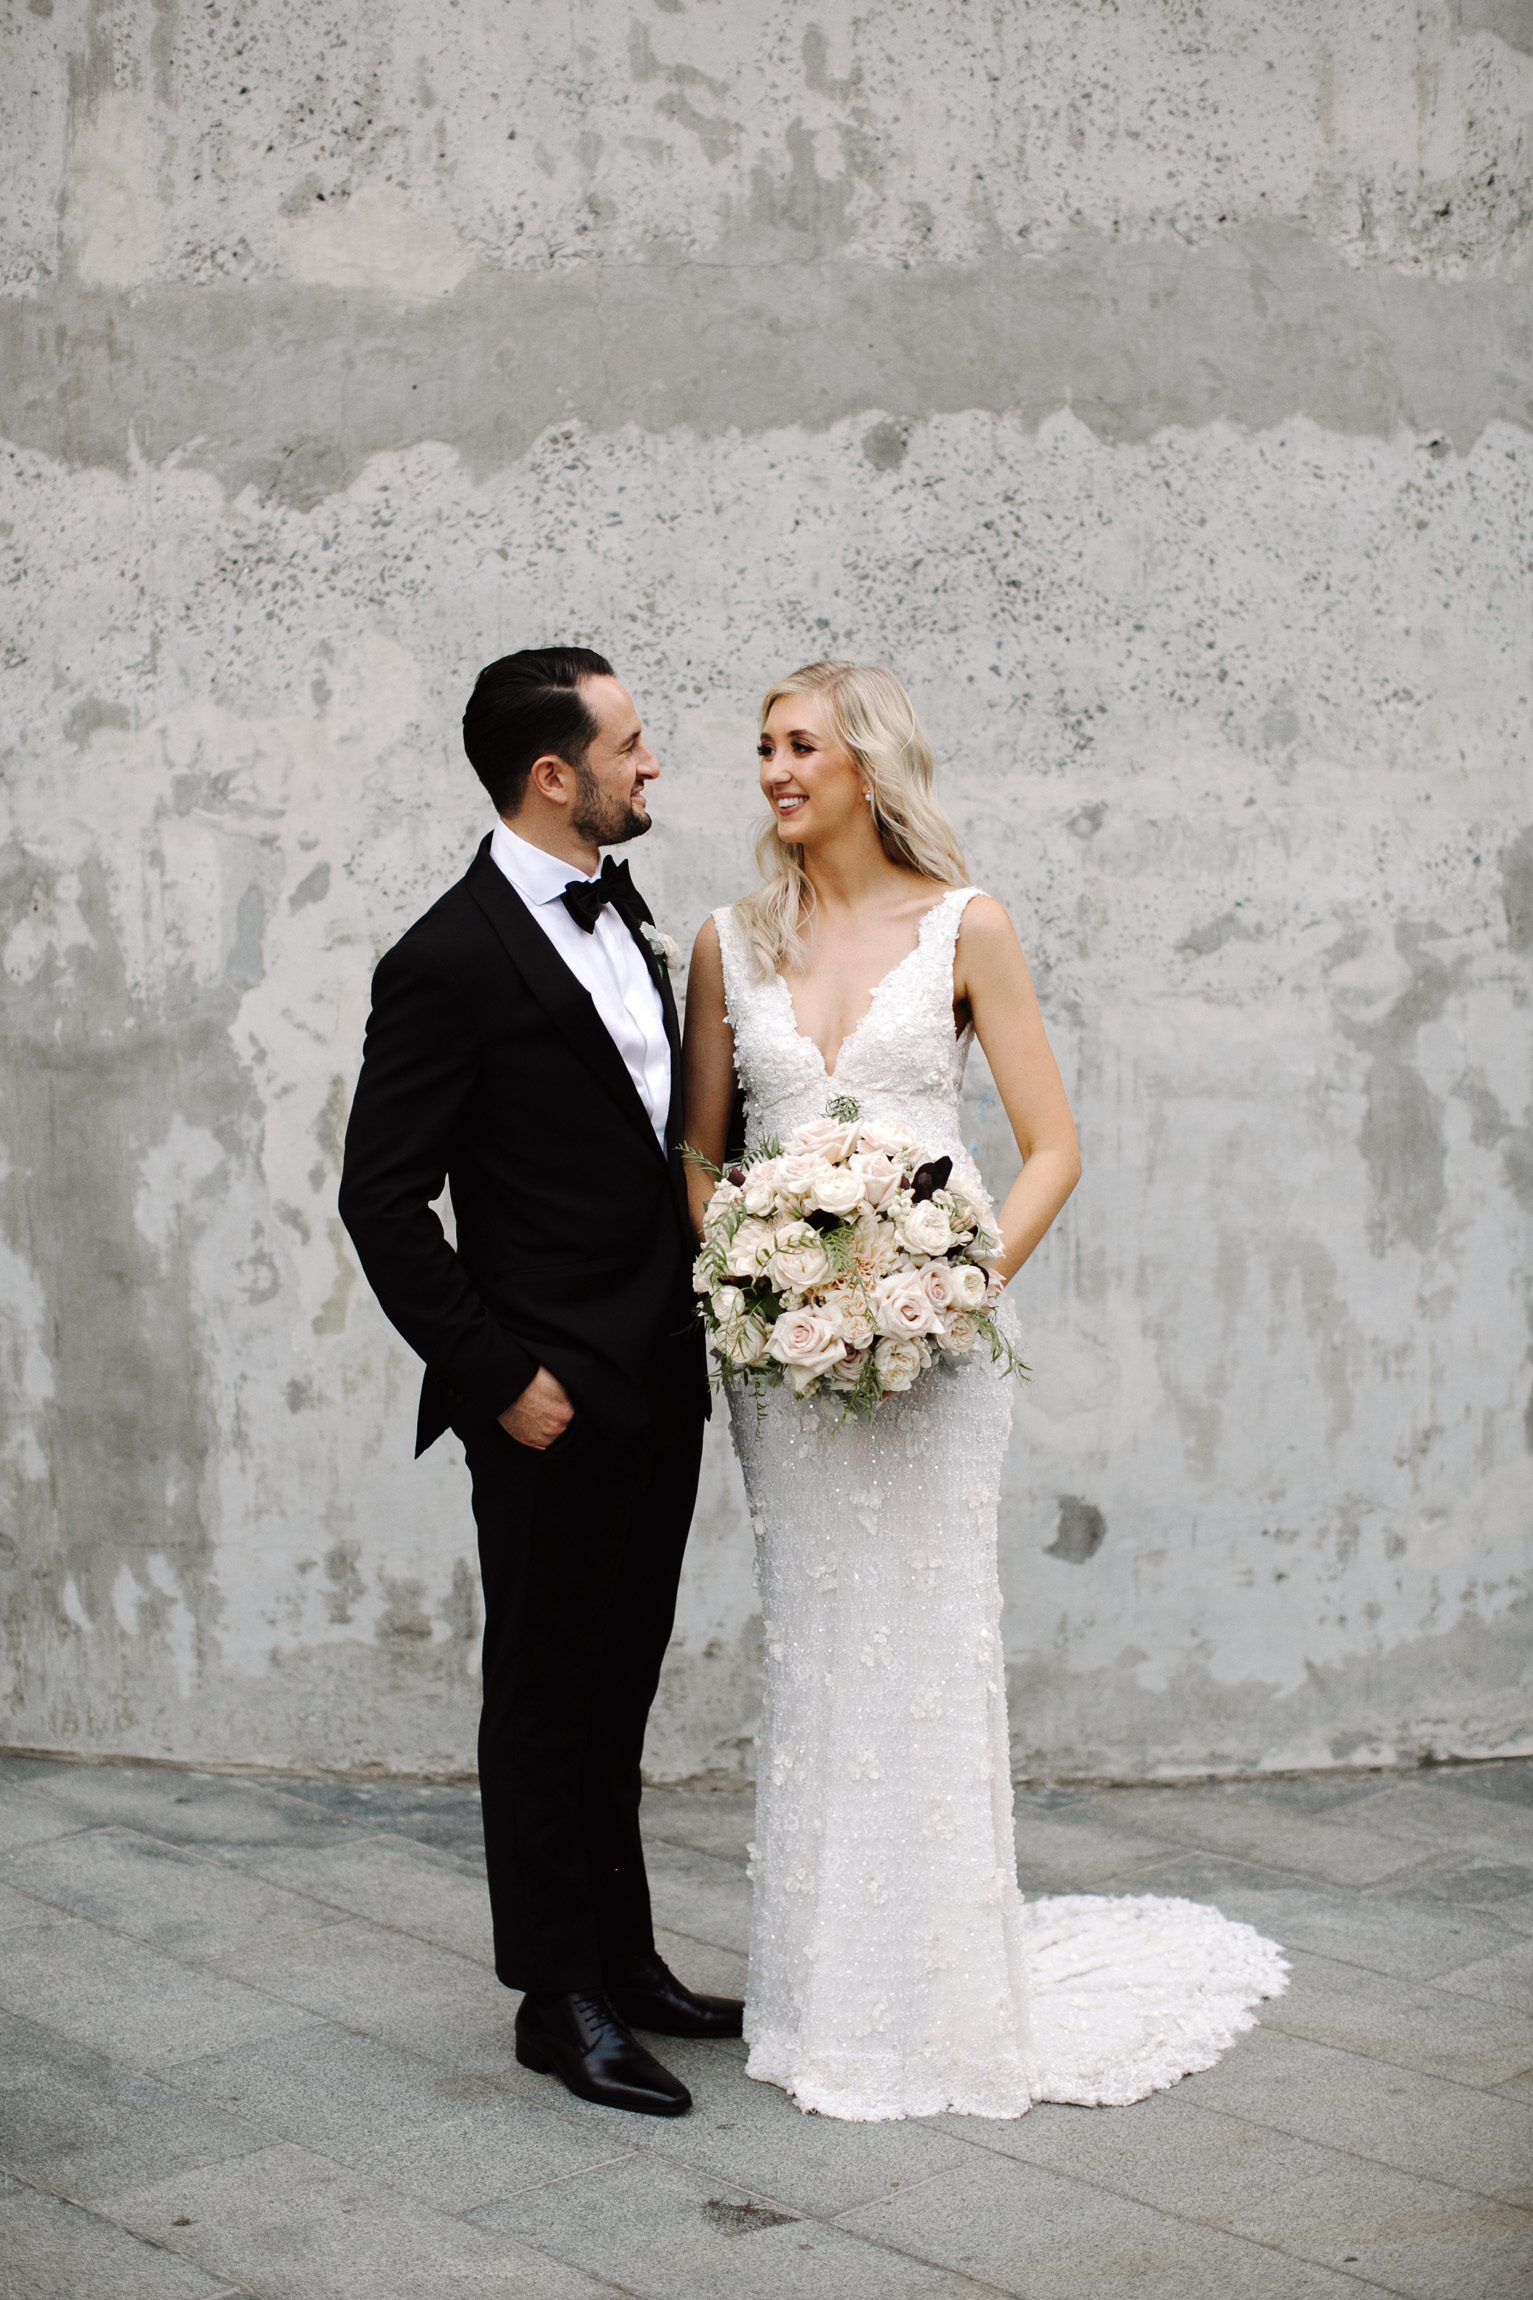 180223_justinaaron_wedding_charlotte_david_h-196.jpg